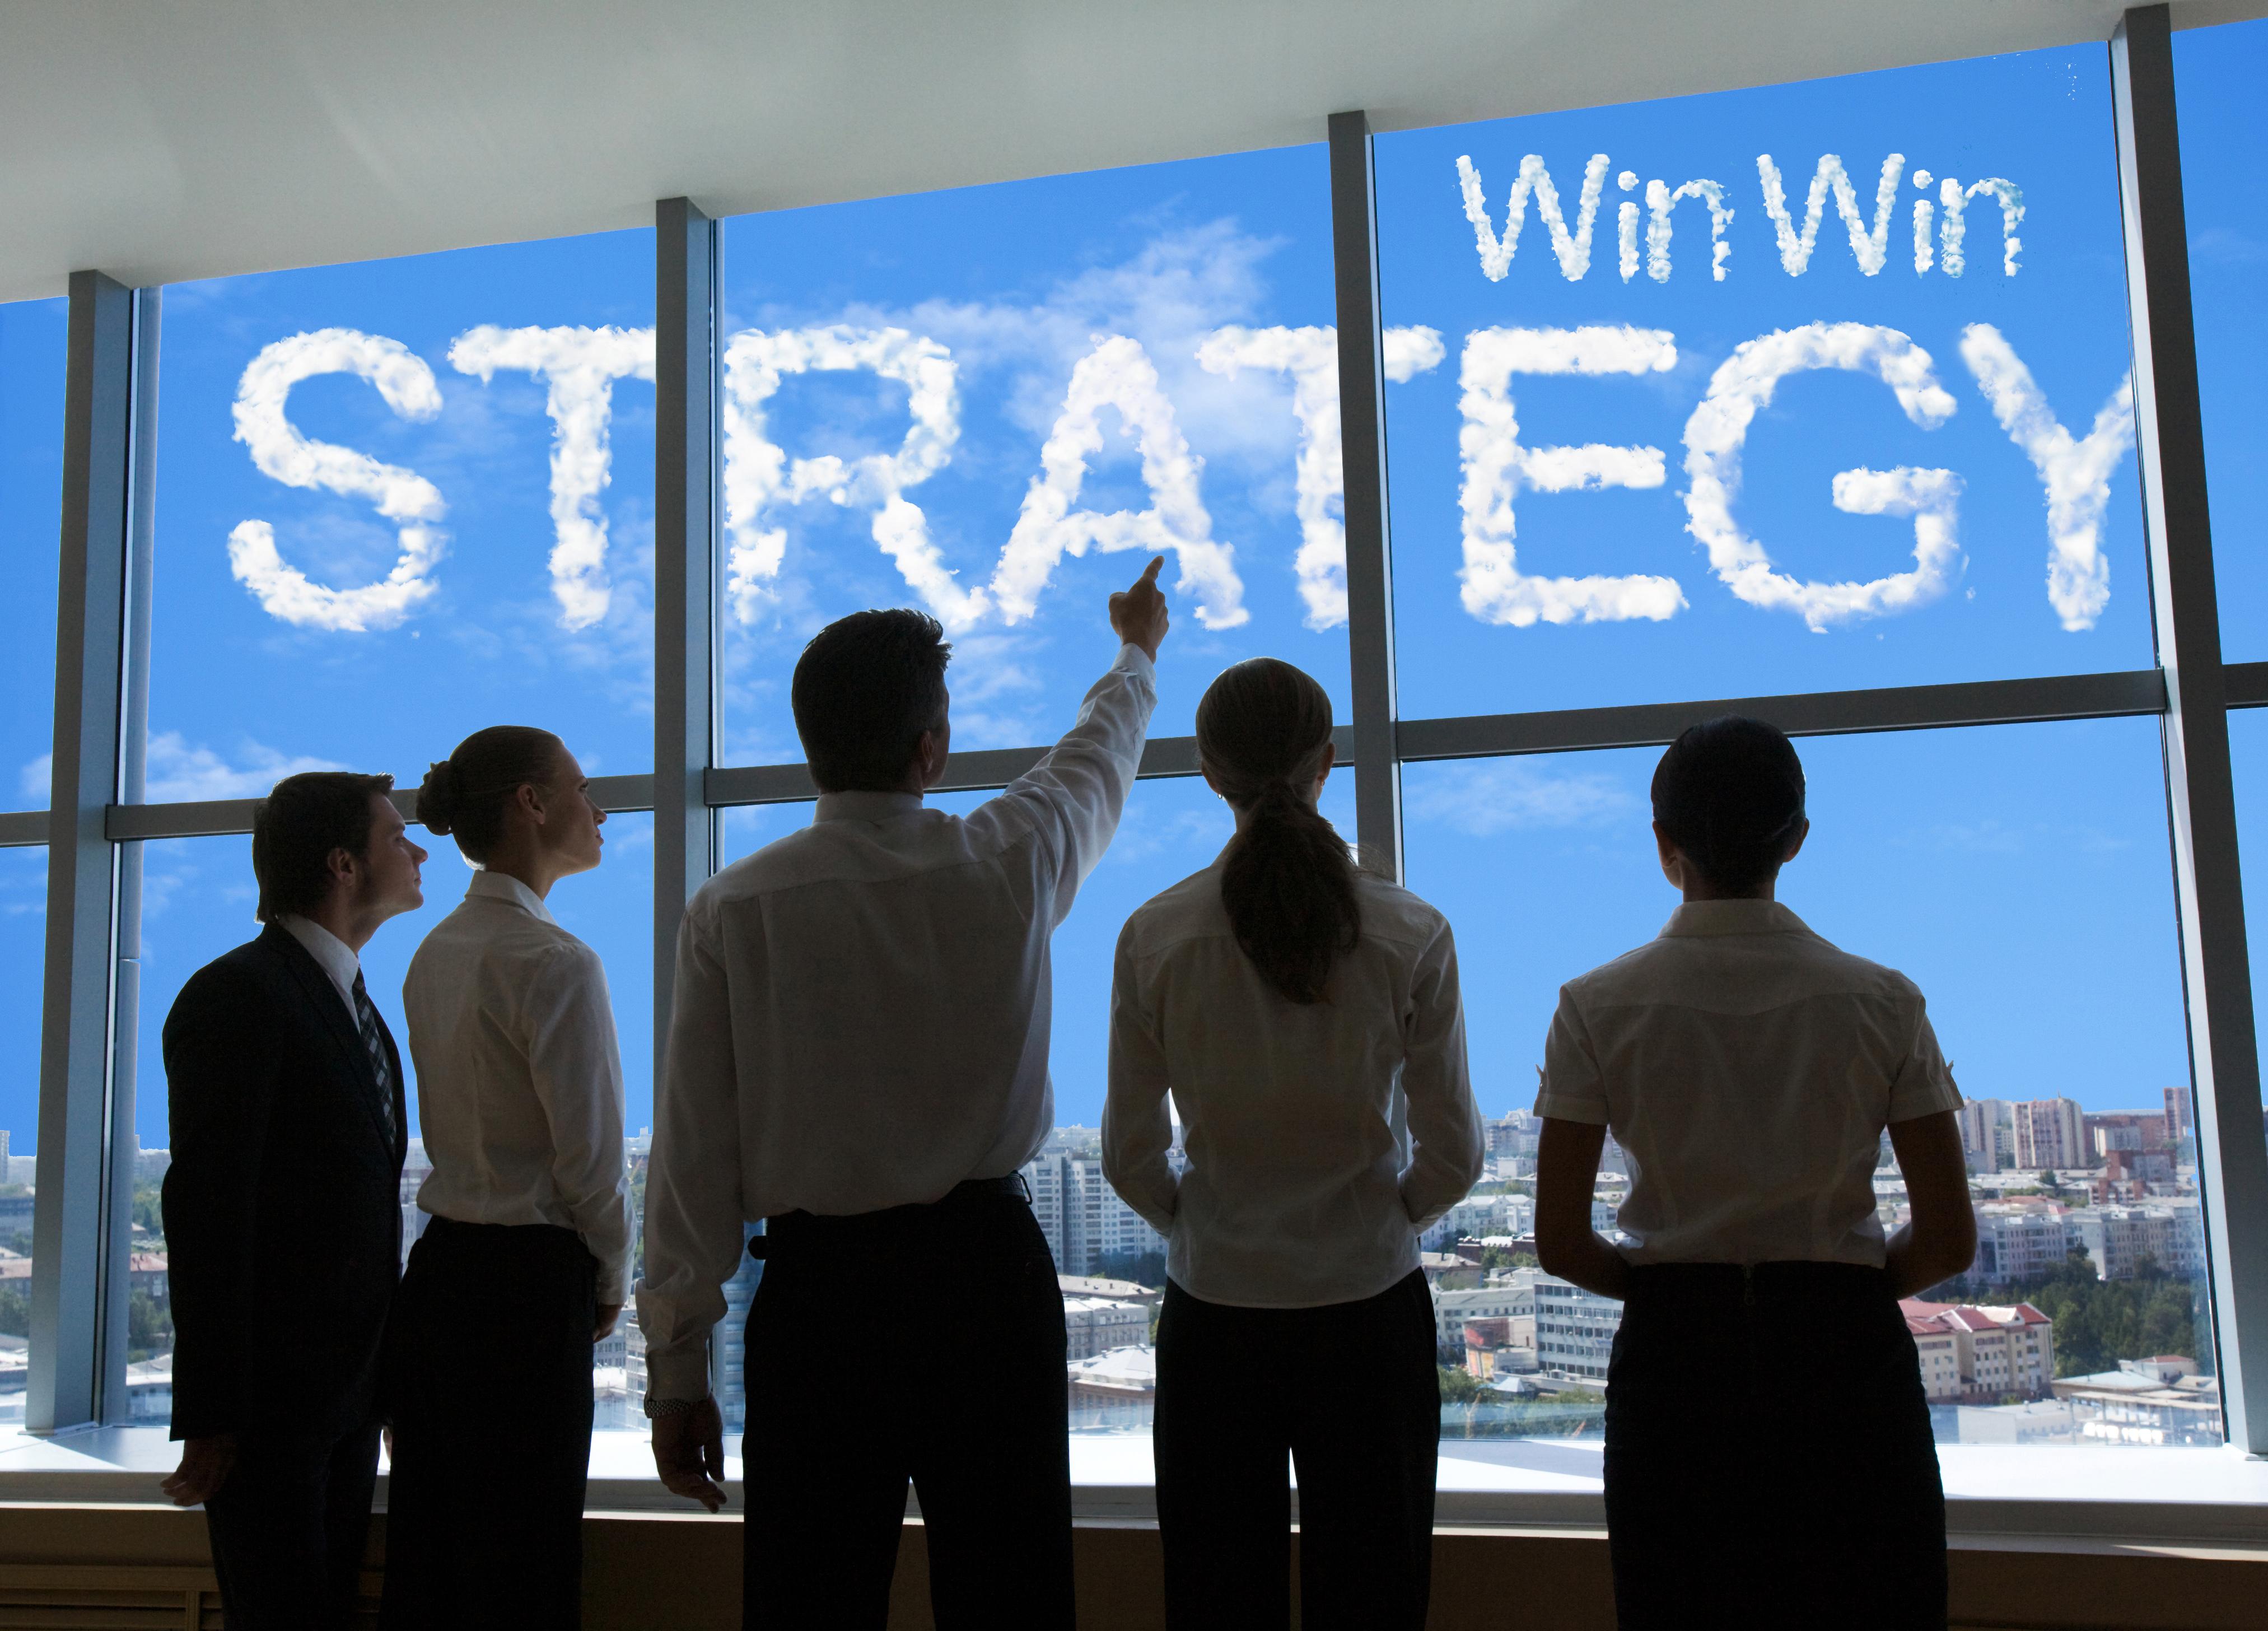 Workforce stimulation through a win-win bonus strategy.